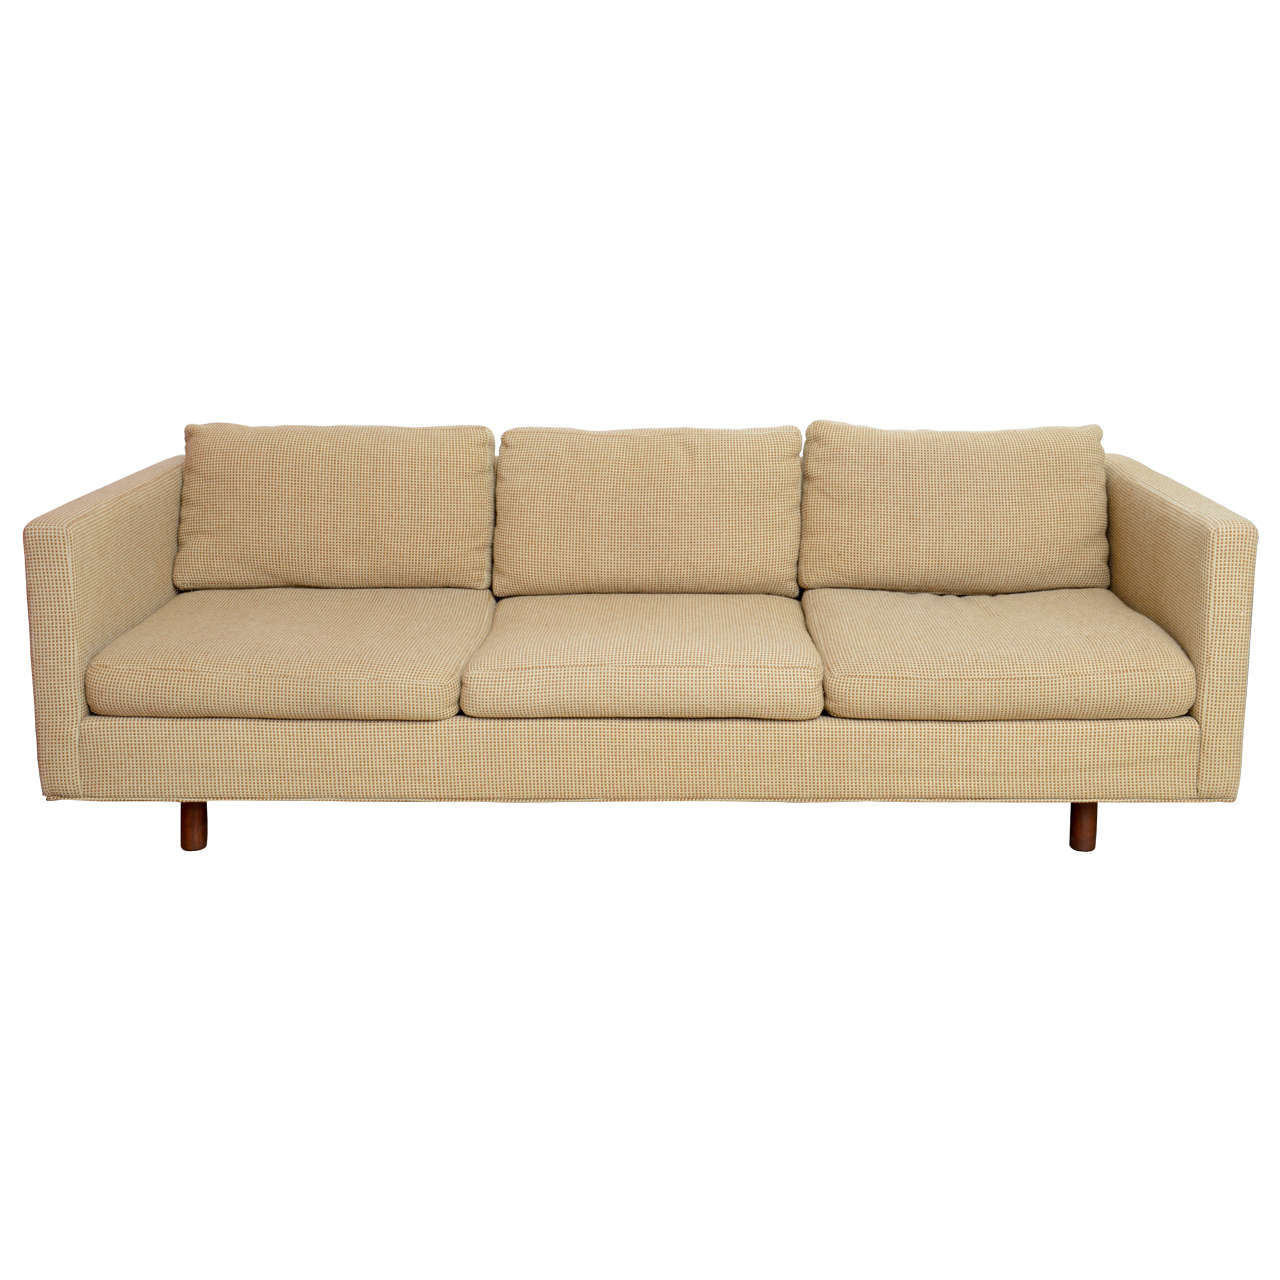 Milo Baughman Sofa For Thayer Coggin At 1stdibs